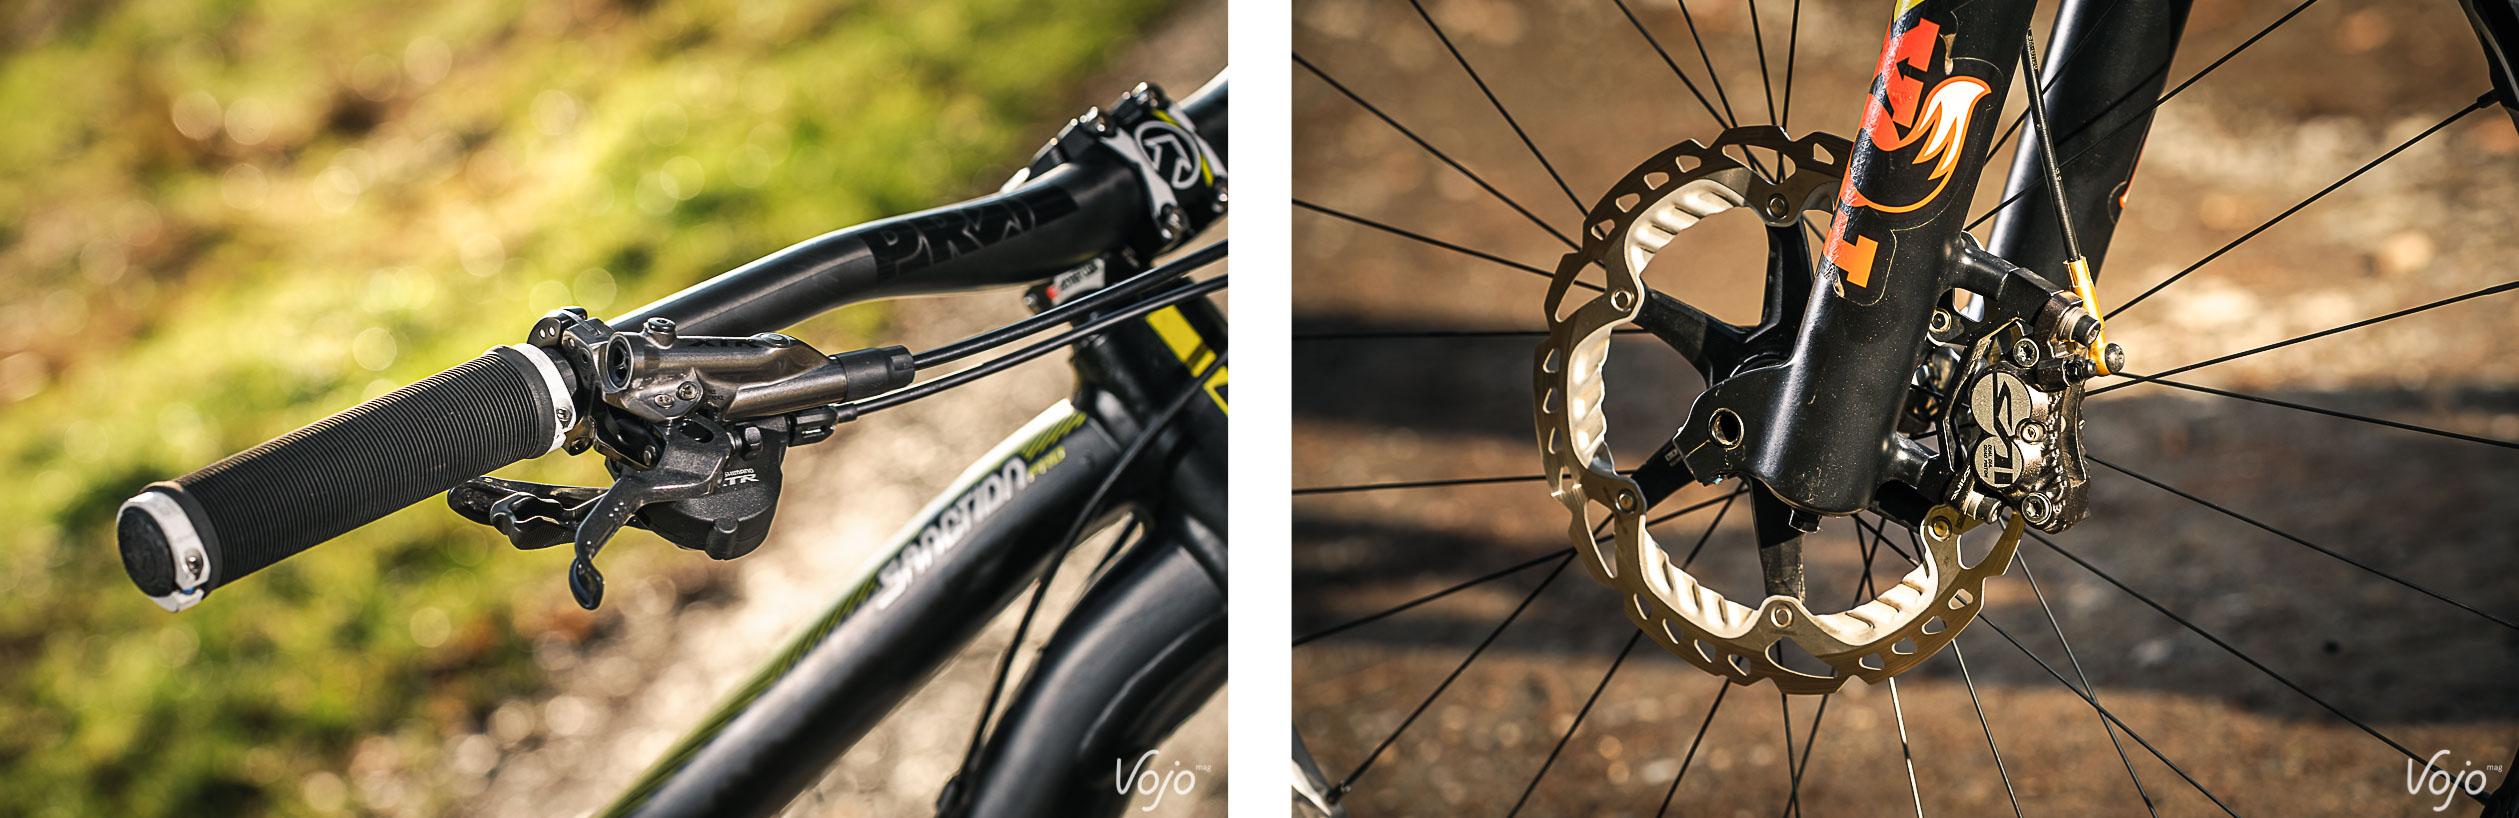 Compo7_Martin_Maes_GT_Sanction_MTB_Bike_Check_Copyright_OBeart_VojoMag-1